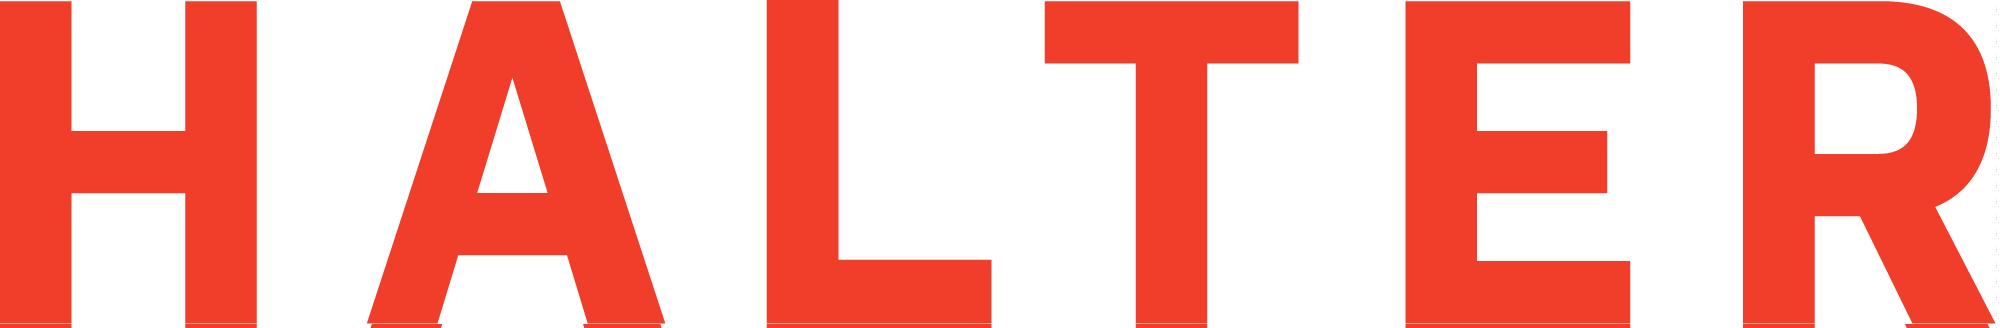 Large Halter Logo